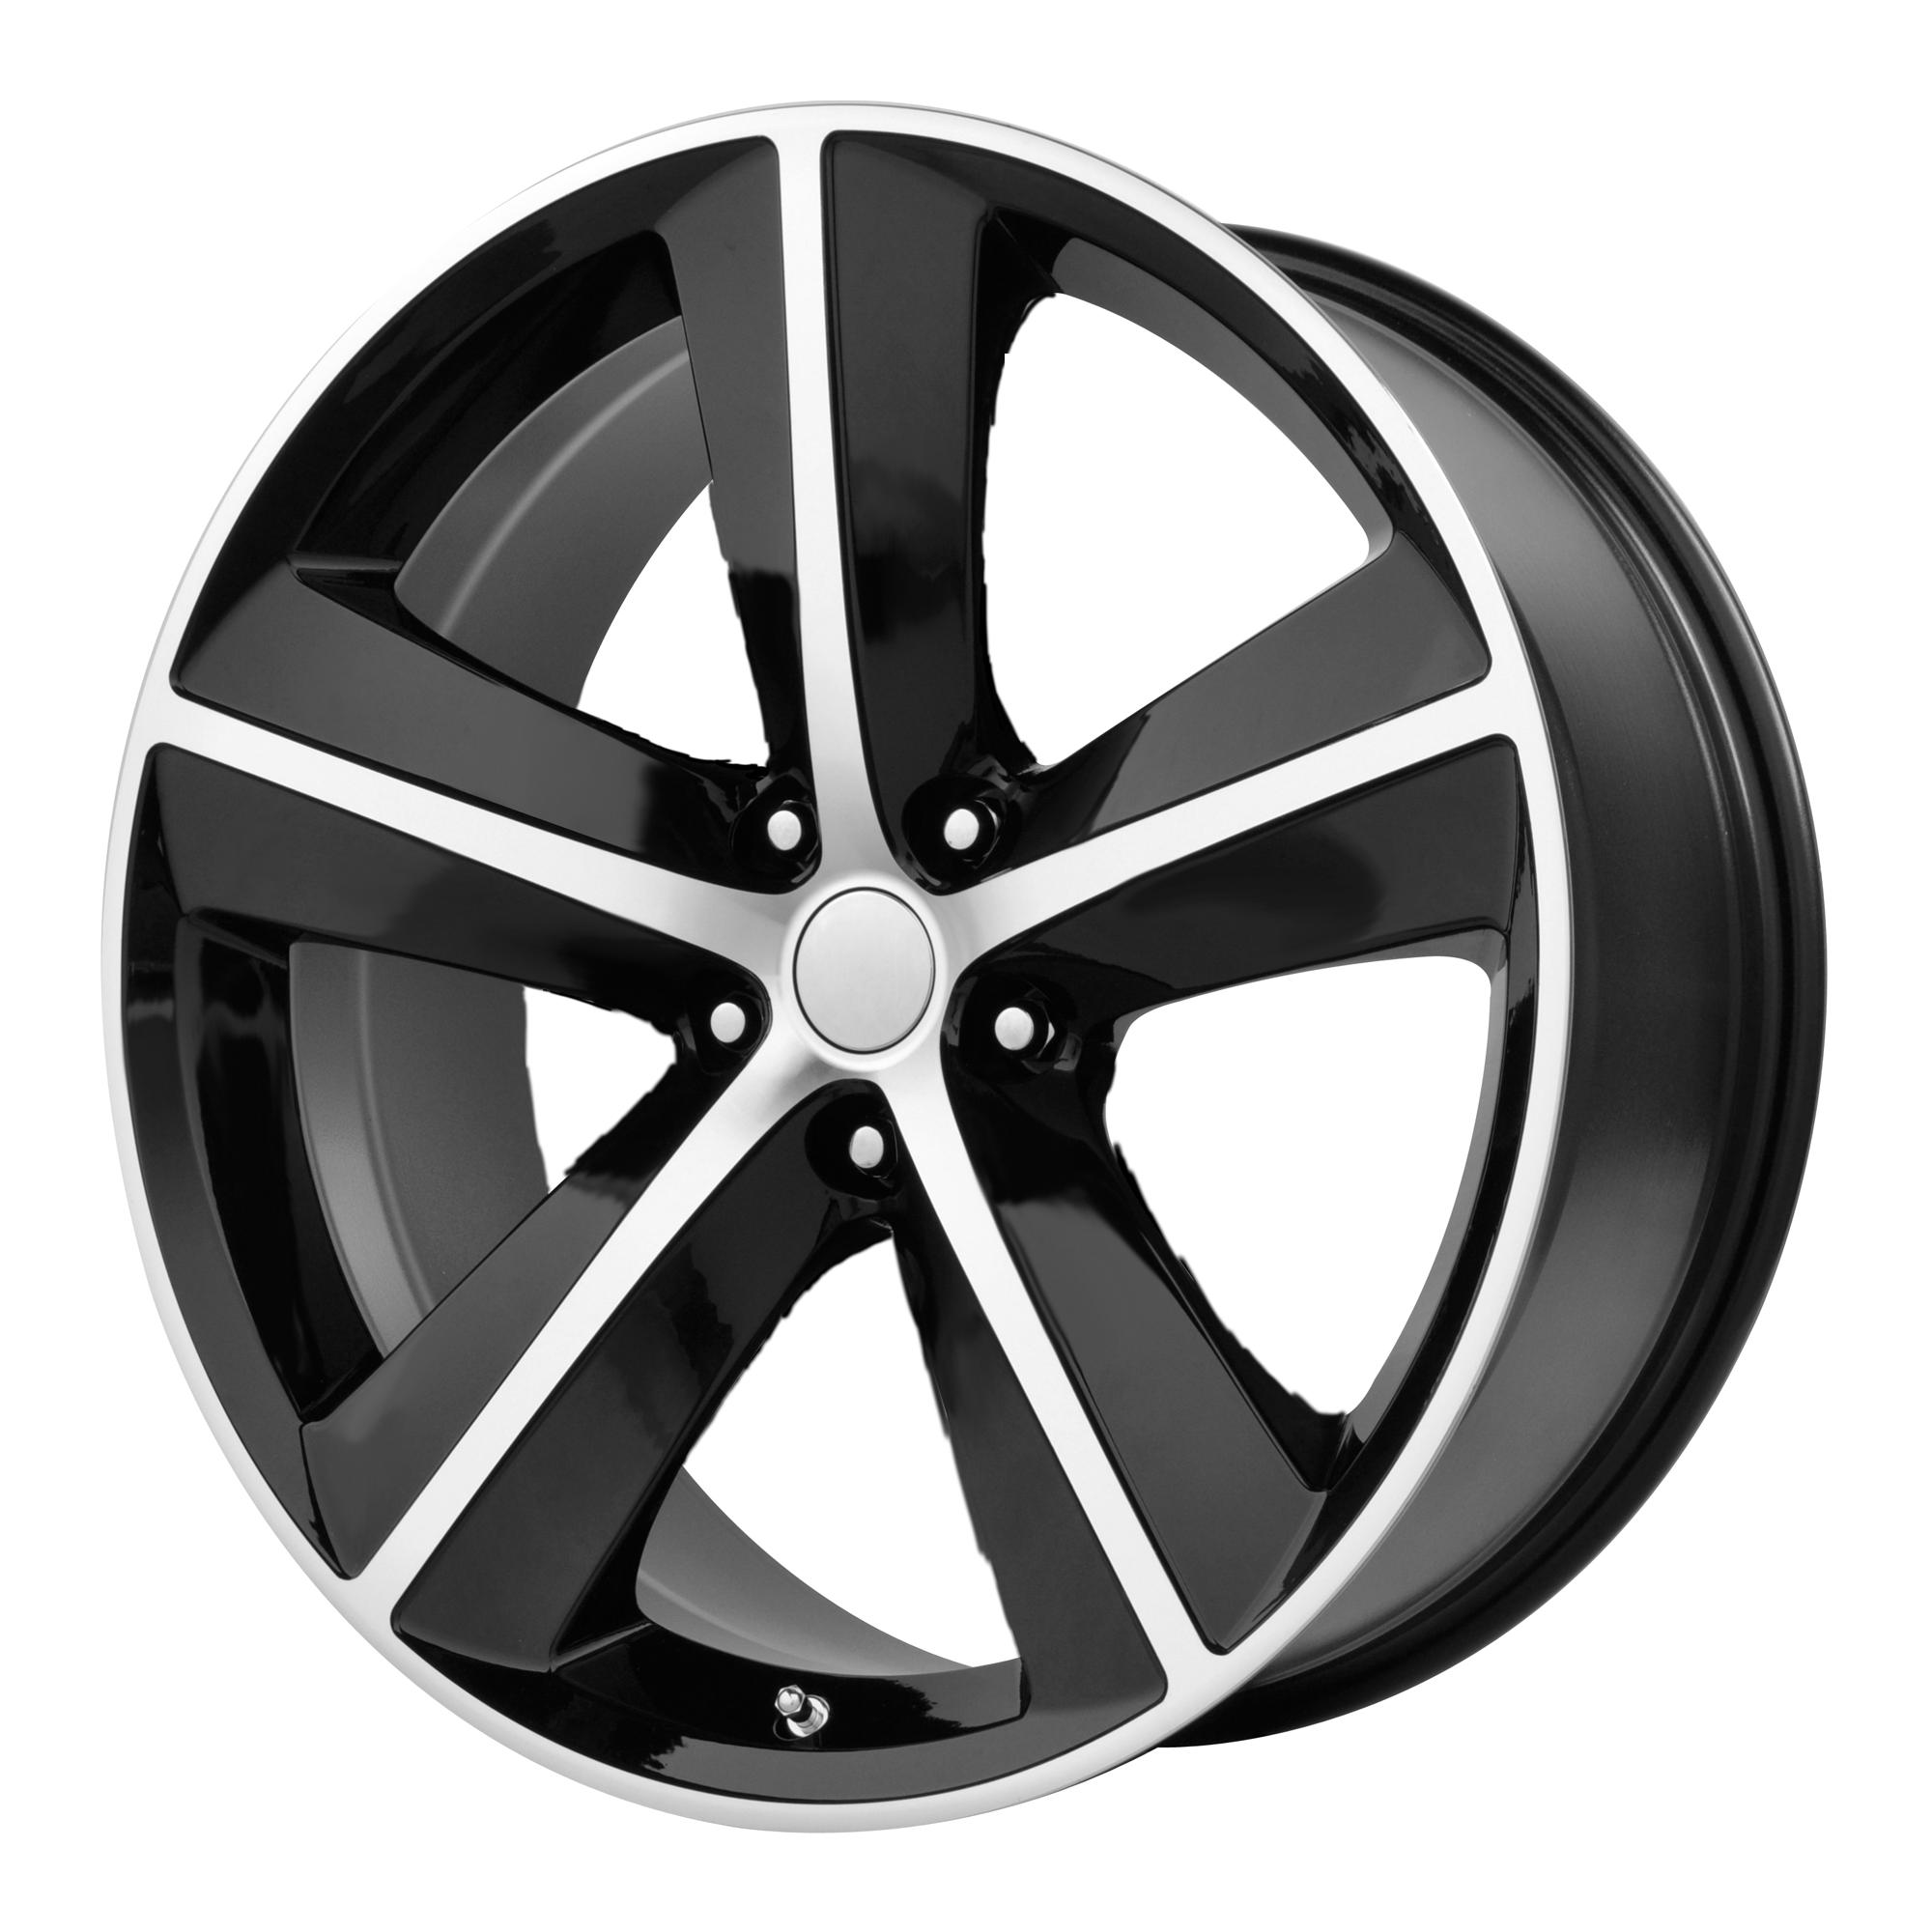 OE Creations Replica Wheels OE Creations 123C Gloss Black w/ Machined Spokes & Lip